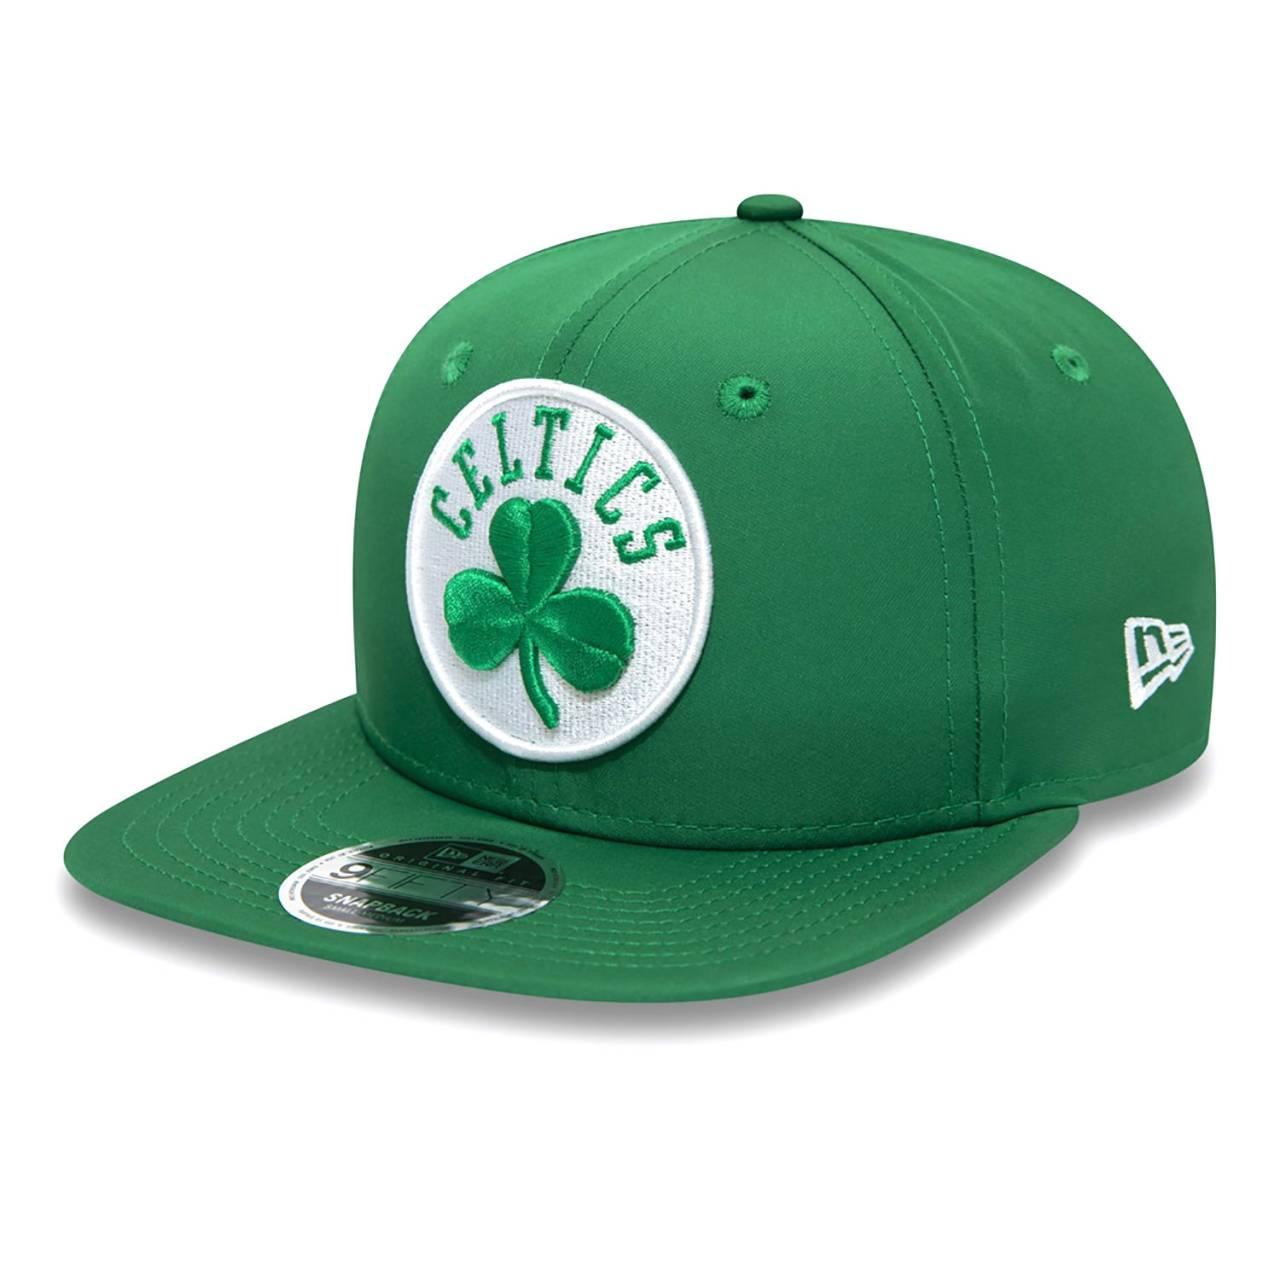 11941681 9FIFTY ORIGINAL FIT NBA BOSTON CELTICS SNAPBACK